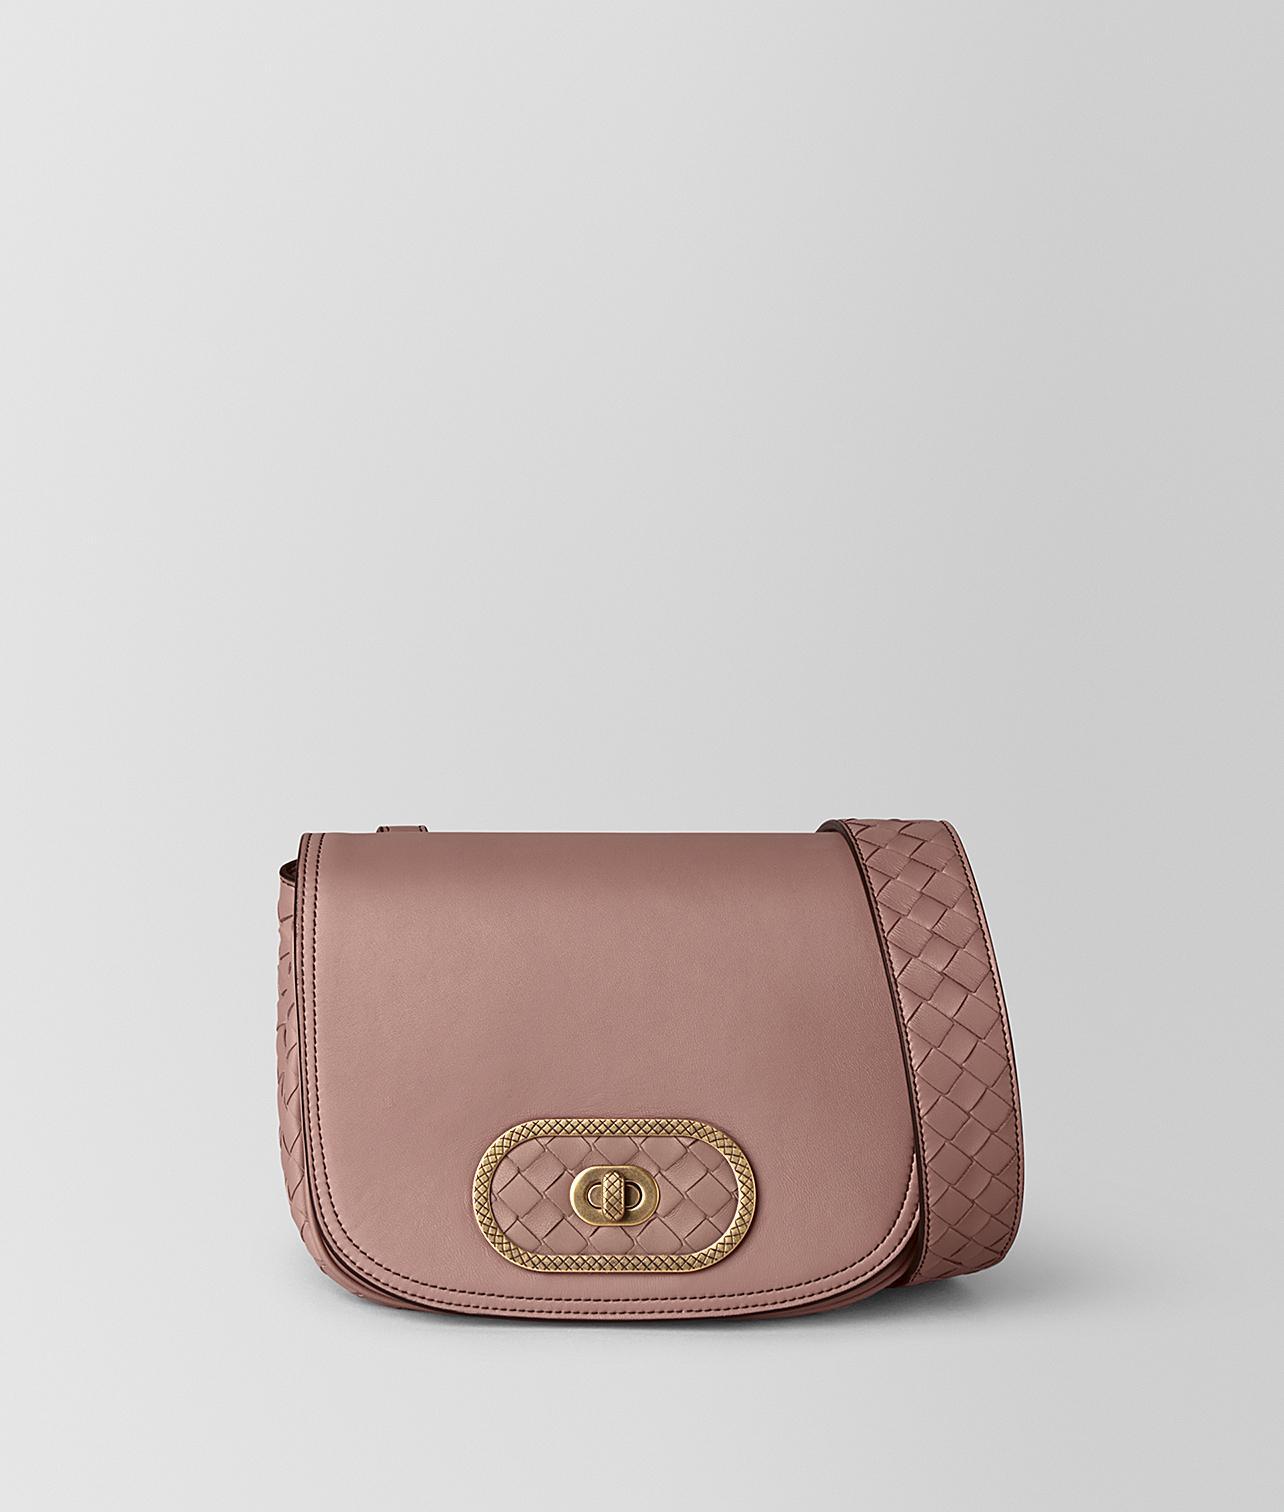 Lyst - Bottega Veneta Bv Luna Bag In Nappa in Pink 33c6d424caa14